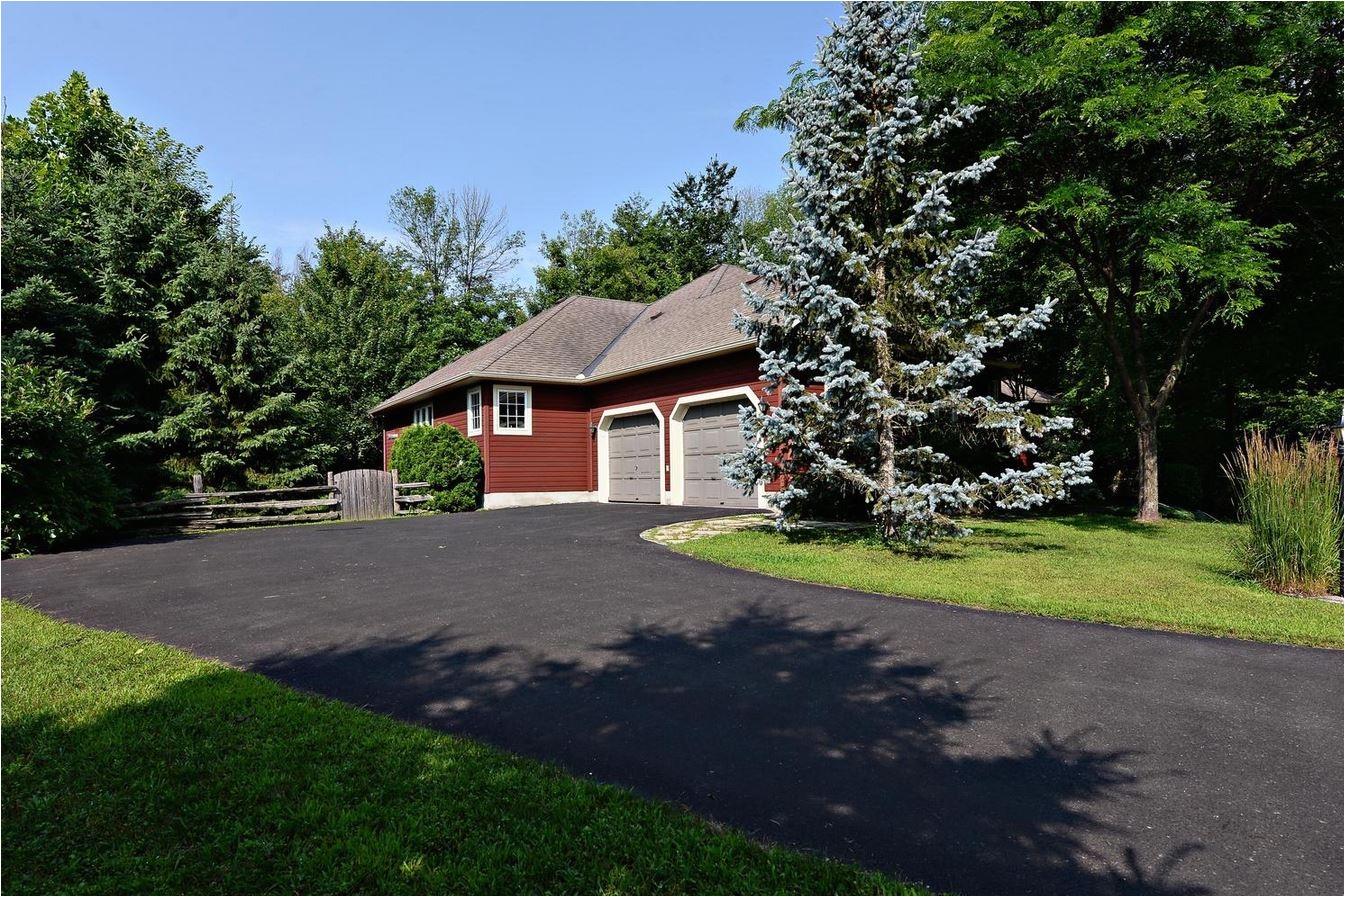 ottawa house for sale in greely 7095 donwel drive shadow ridge 534900